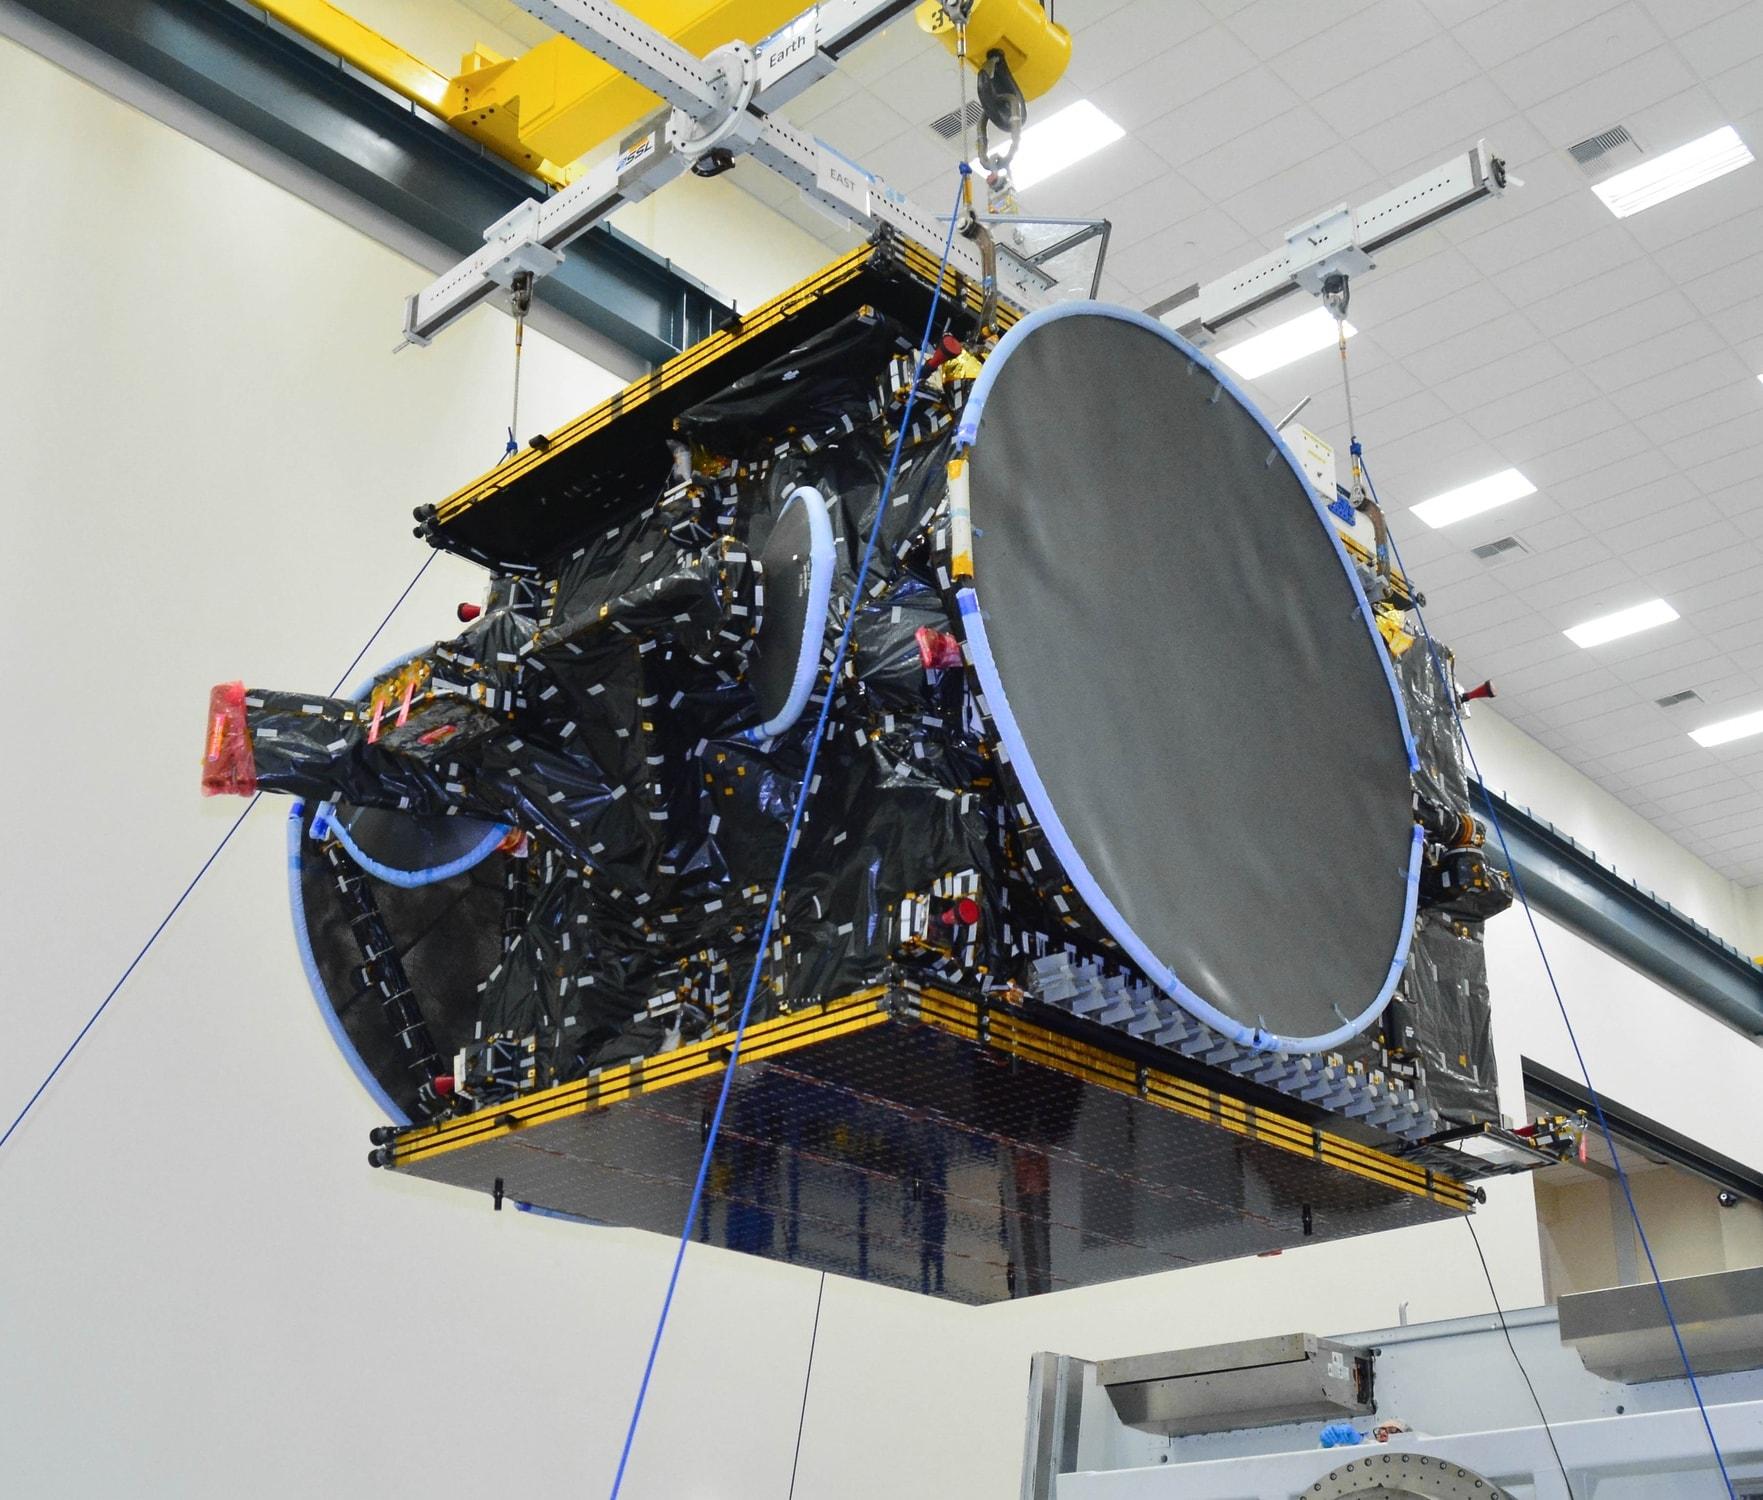 BulgariaSat-1